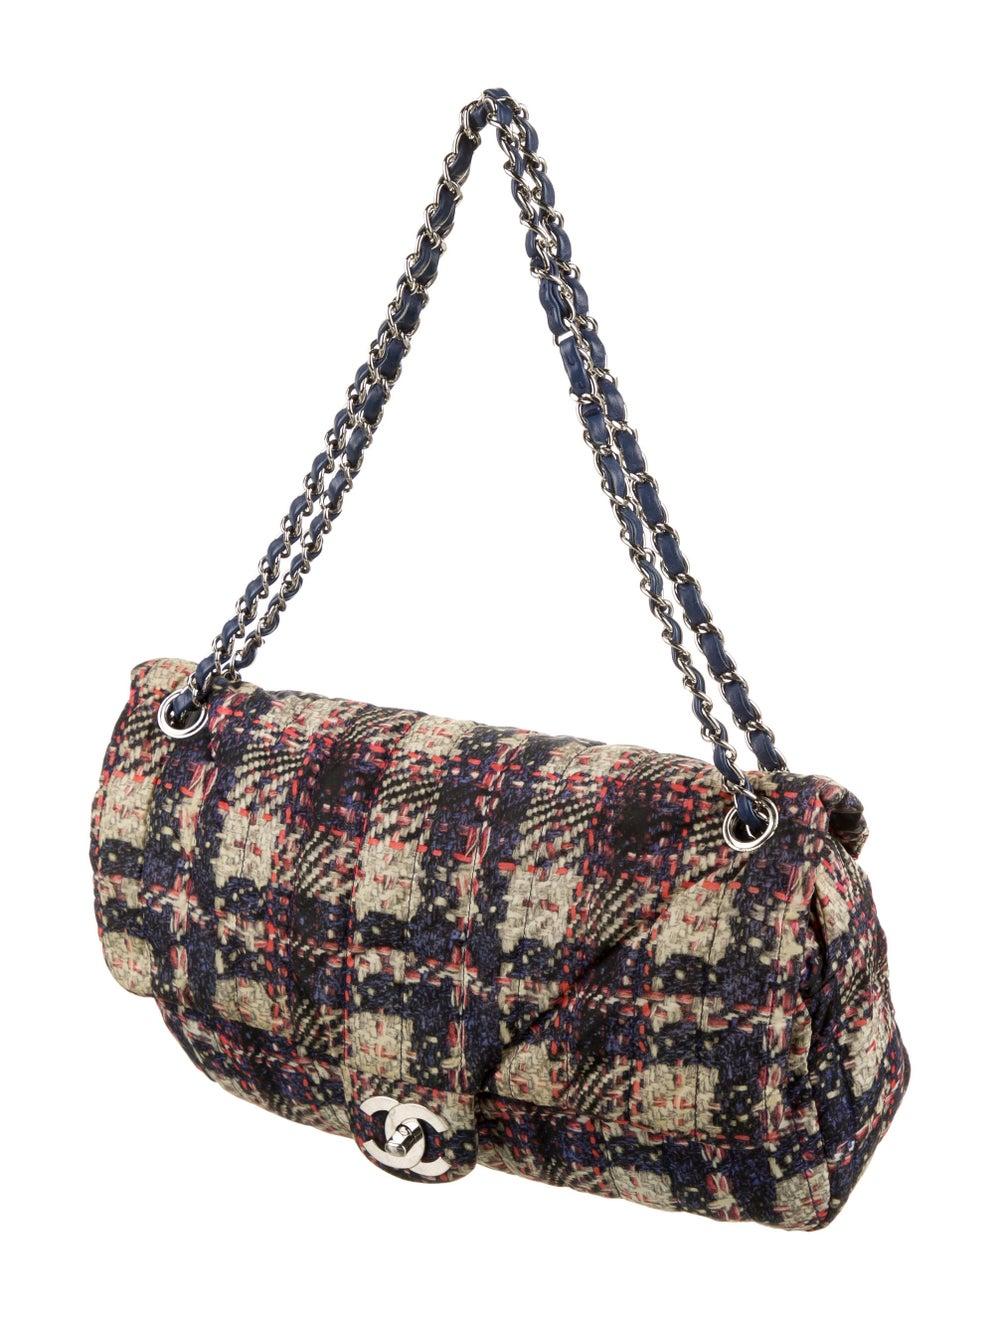 Chanel Medium Nylon Tweed Flap Bag Blue - image 3